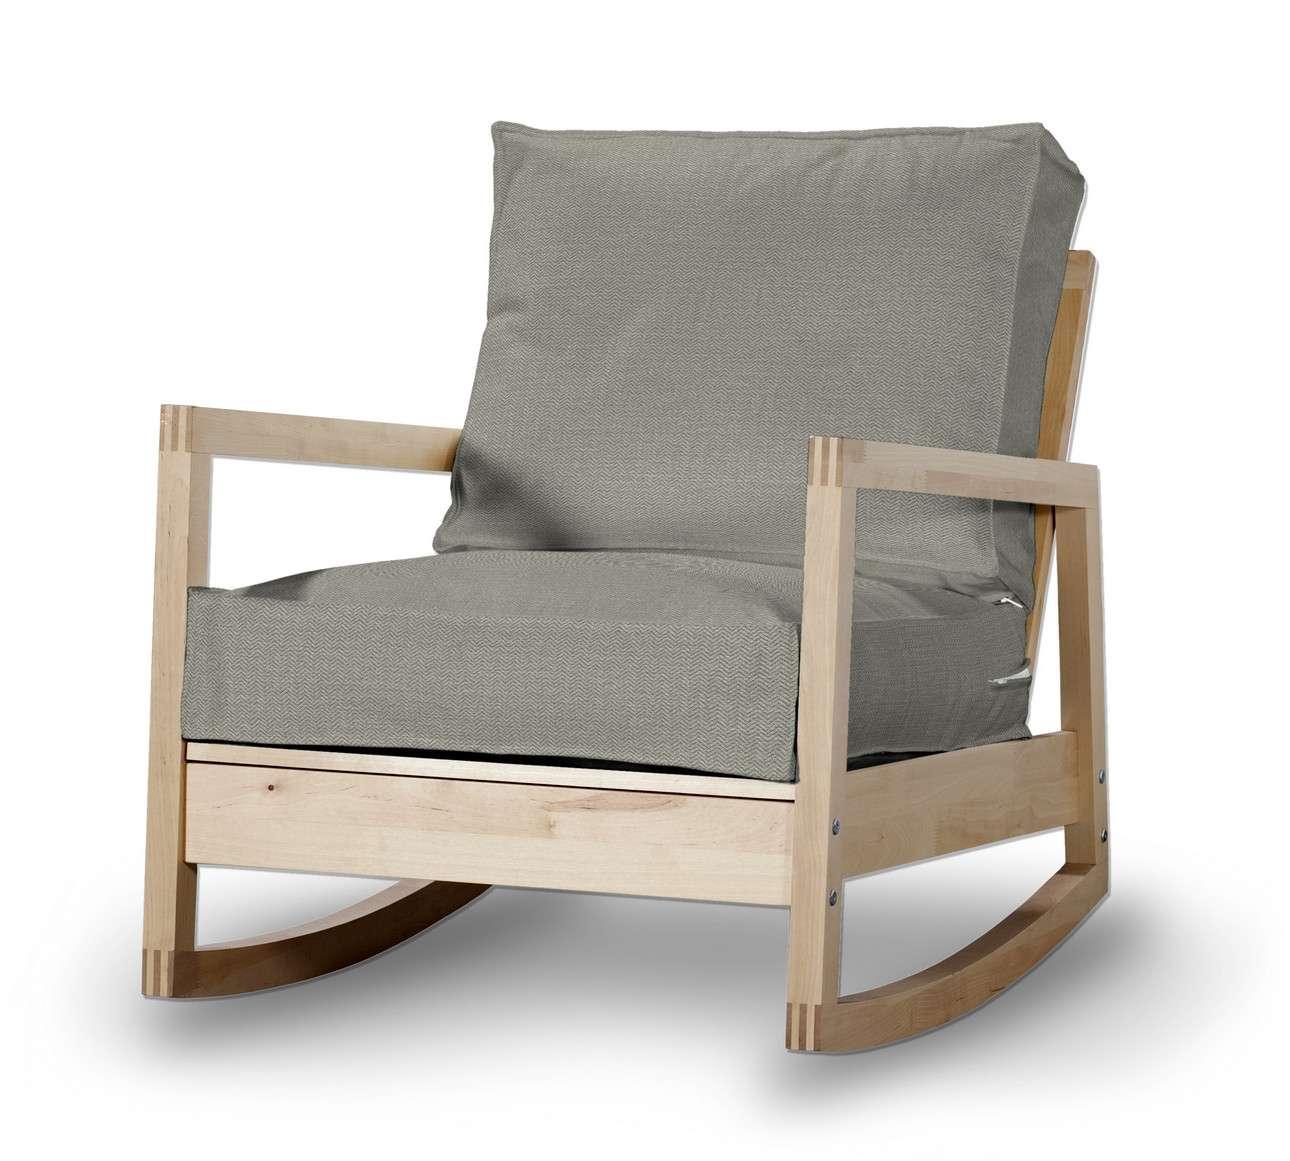 Pokrowiec na fotel Lillberg w kolekcji Bergen, tkanina: 161-83